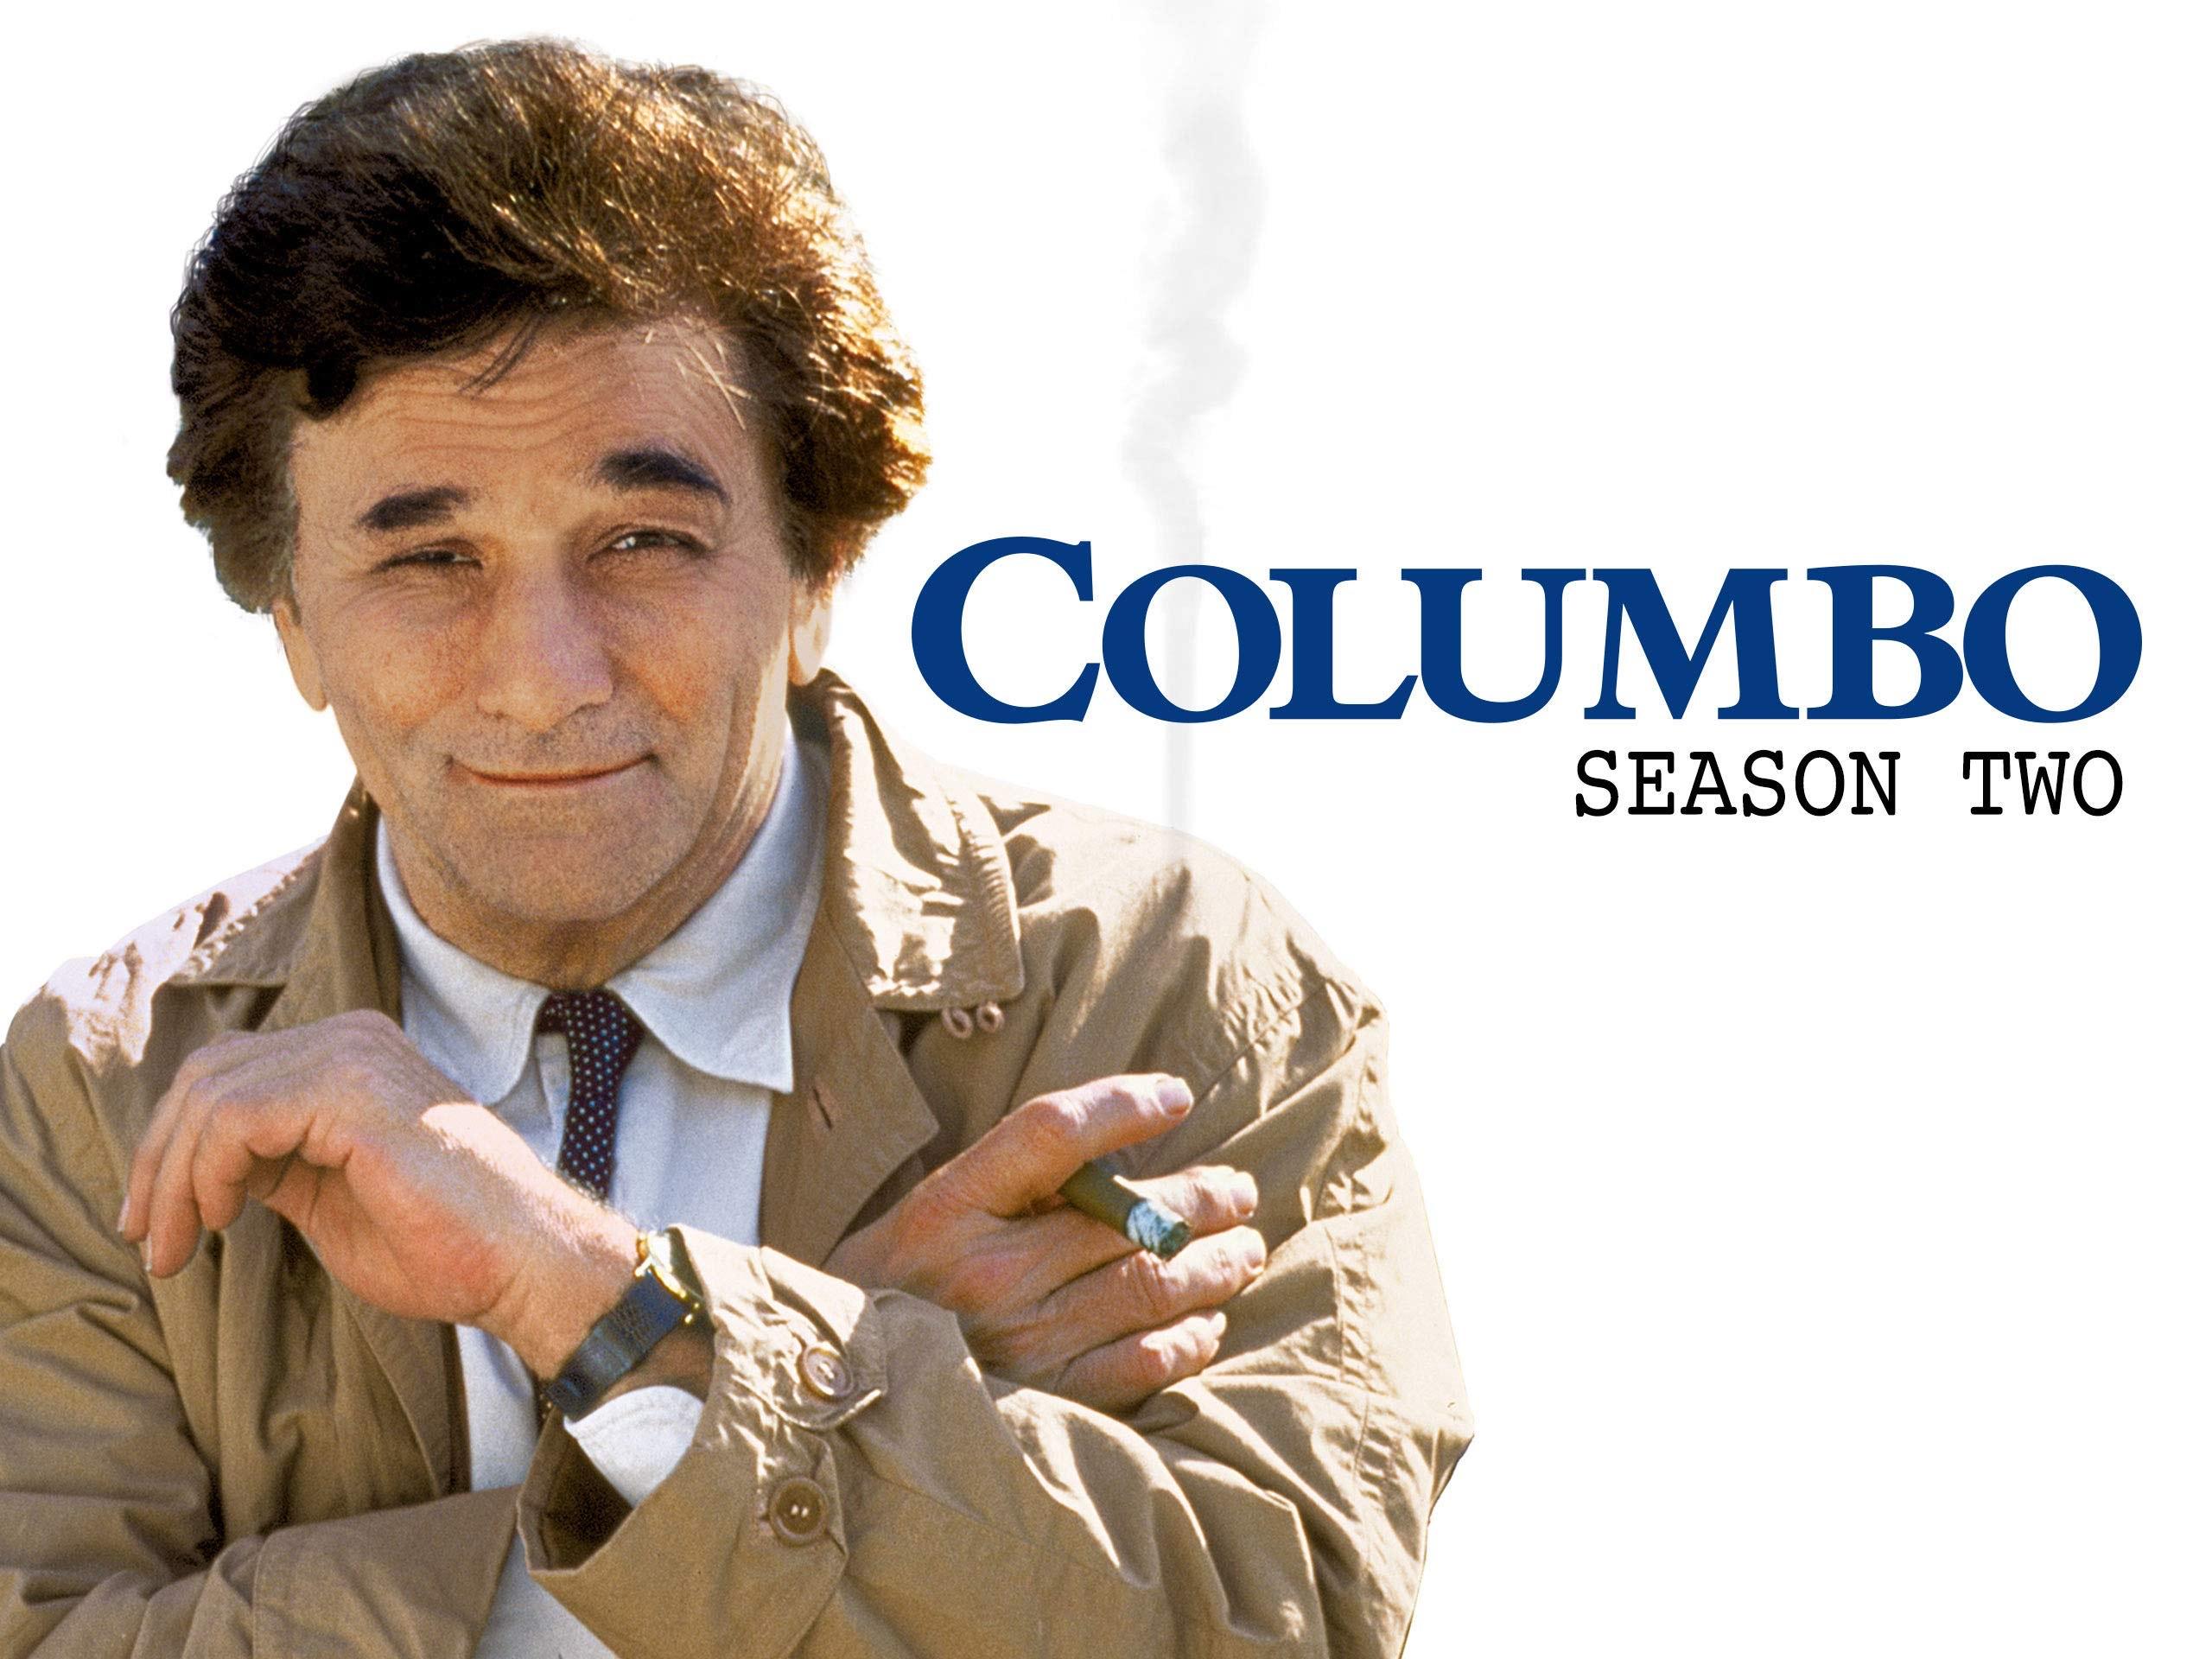 Columbo - Season 2 in HD £3.99 at Amazon Instant Video